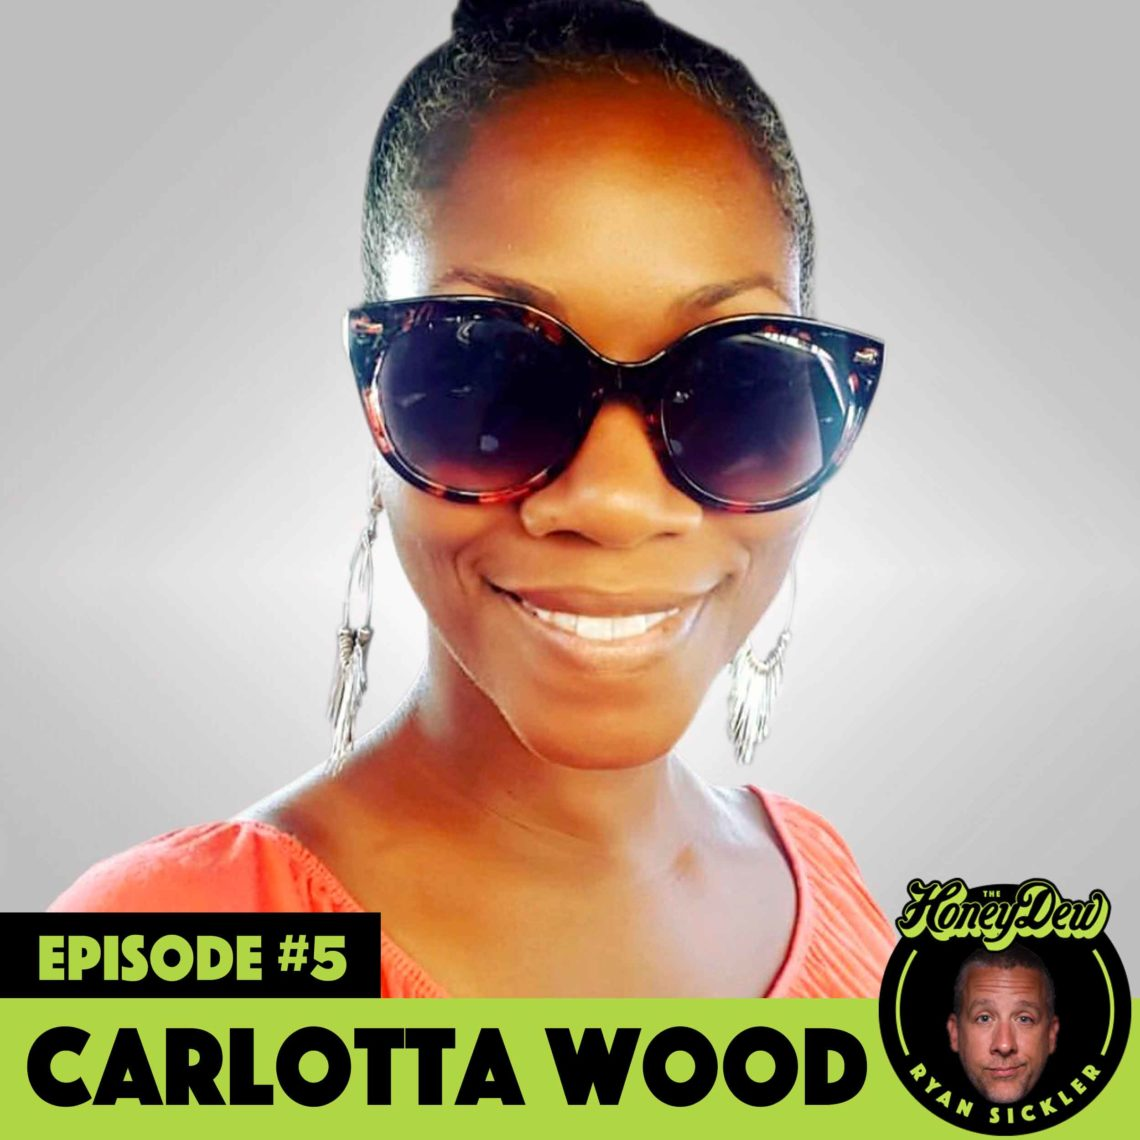 Carlotta Wood